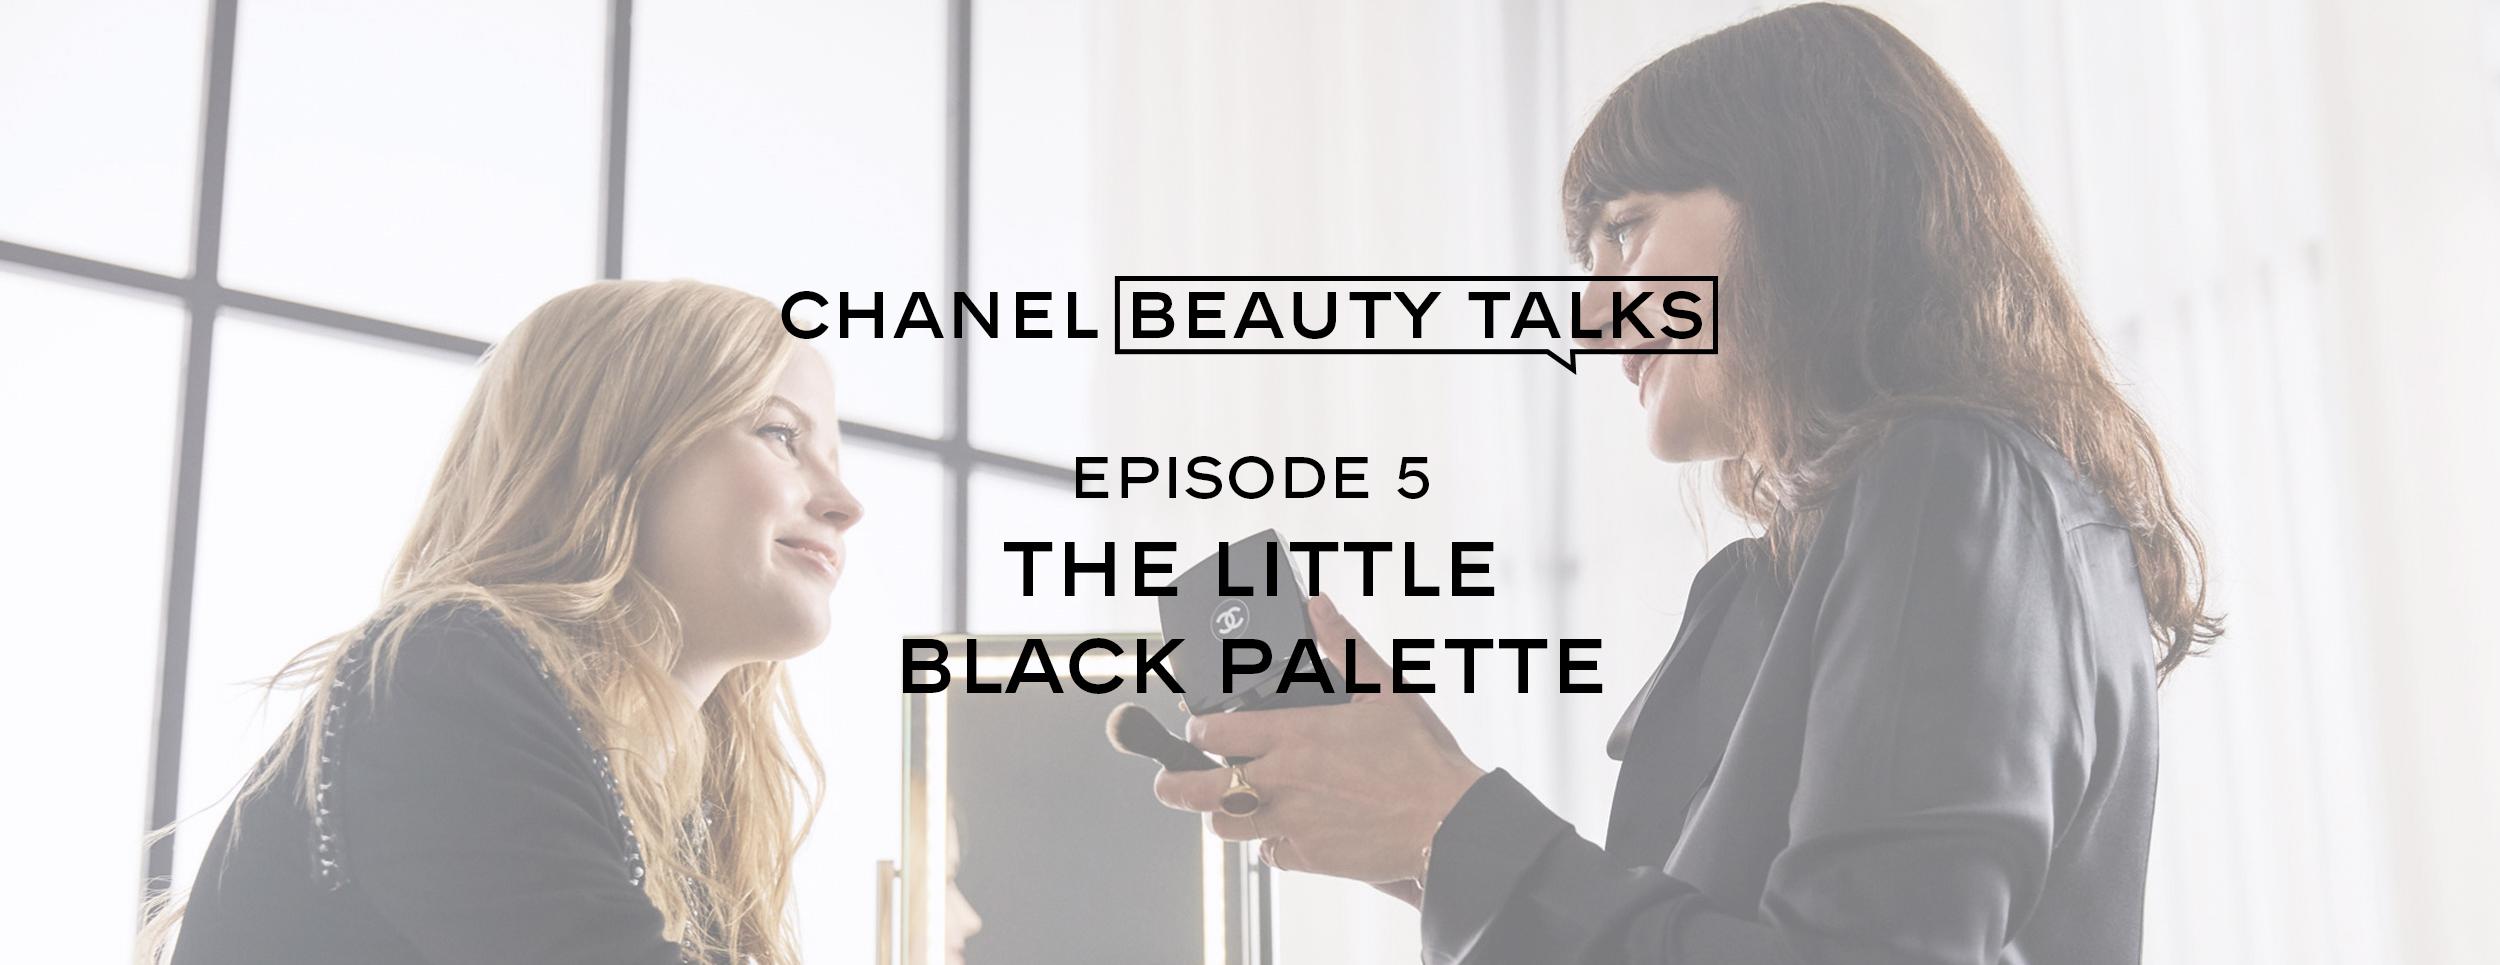 Simak Diskusi Lucia Pica dengan Ellie Bamber dalam Chanel Beauty Talks